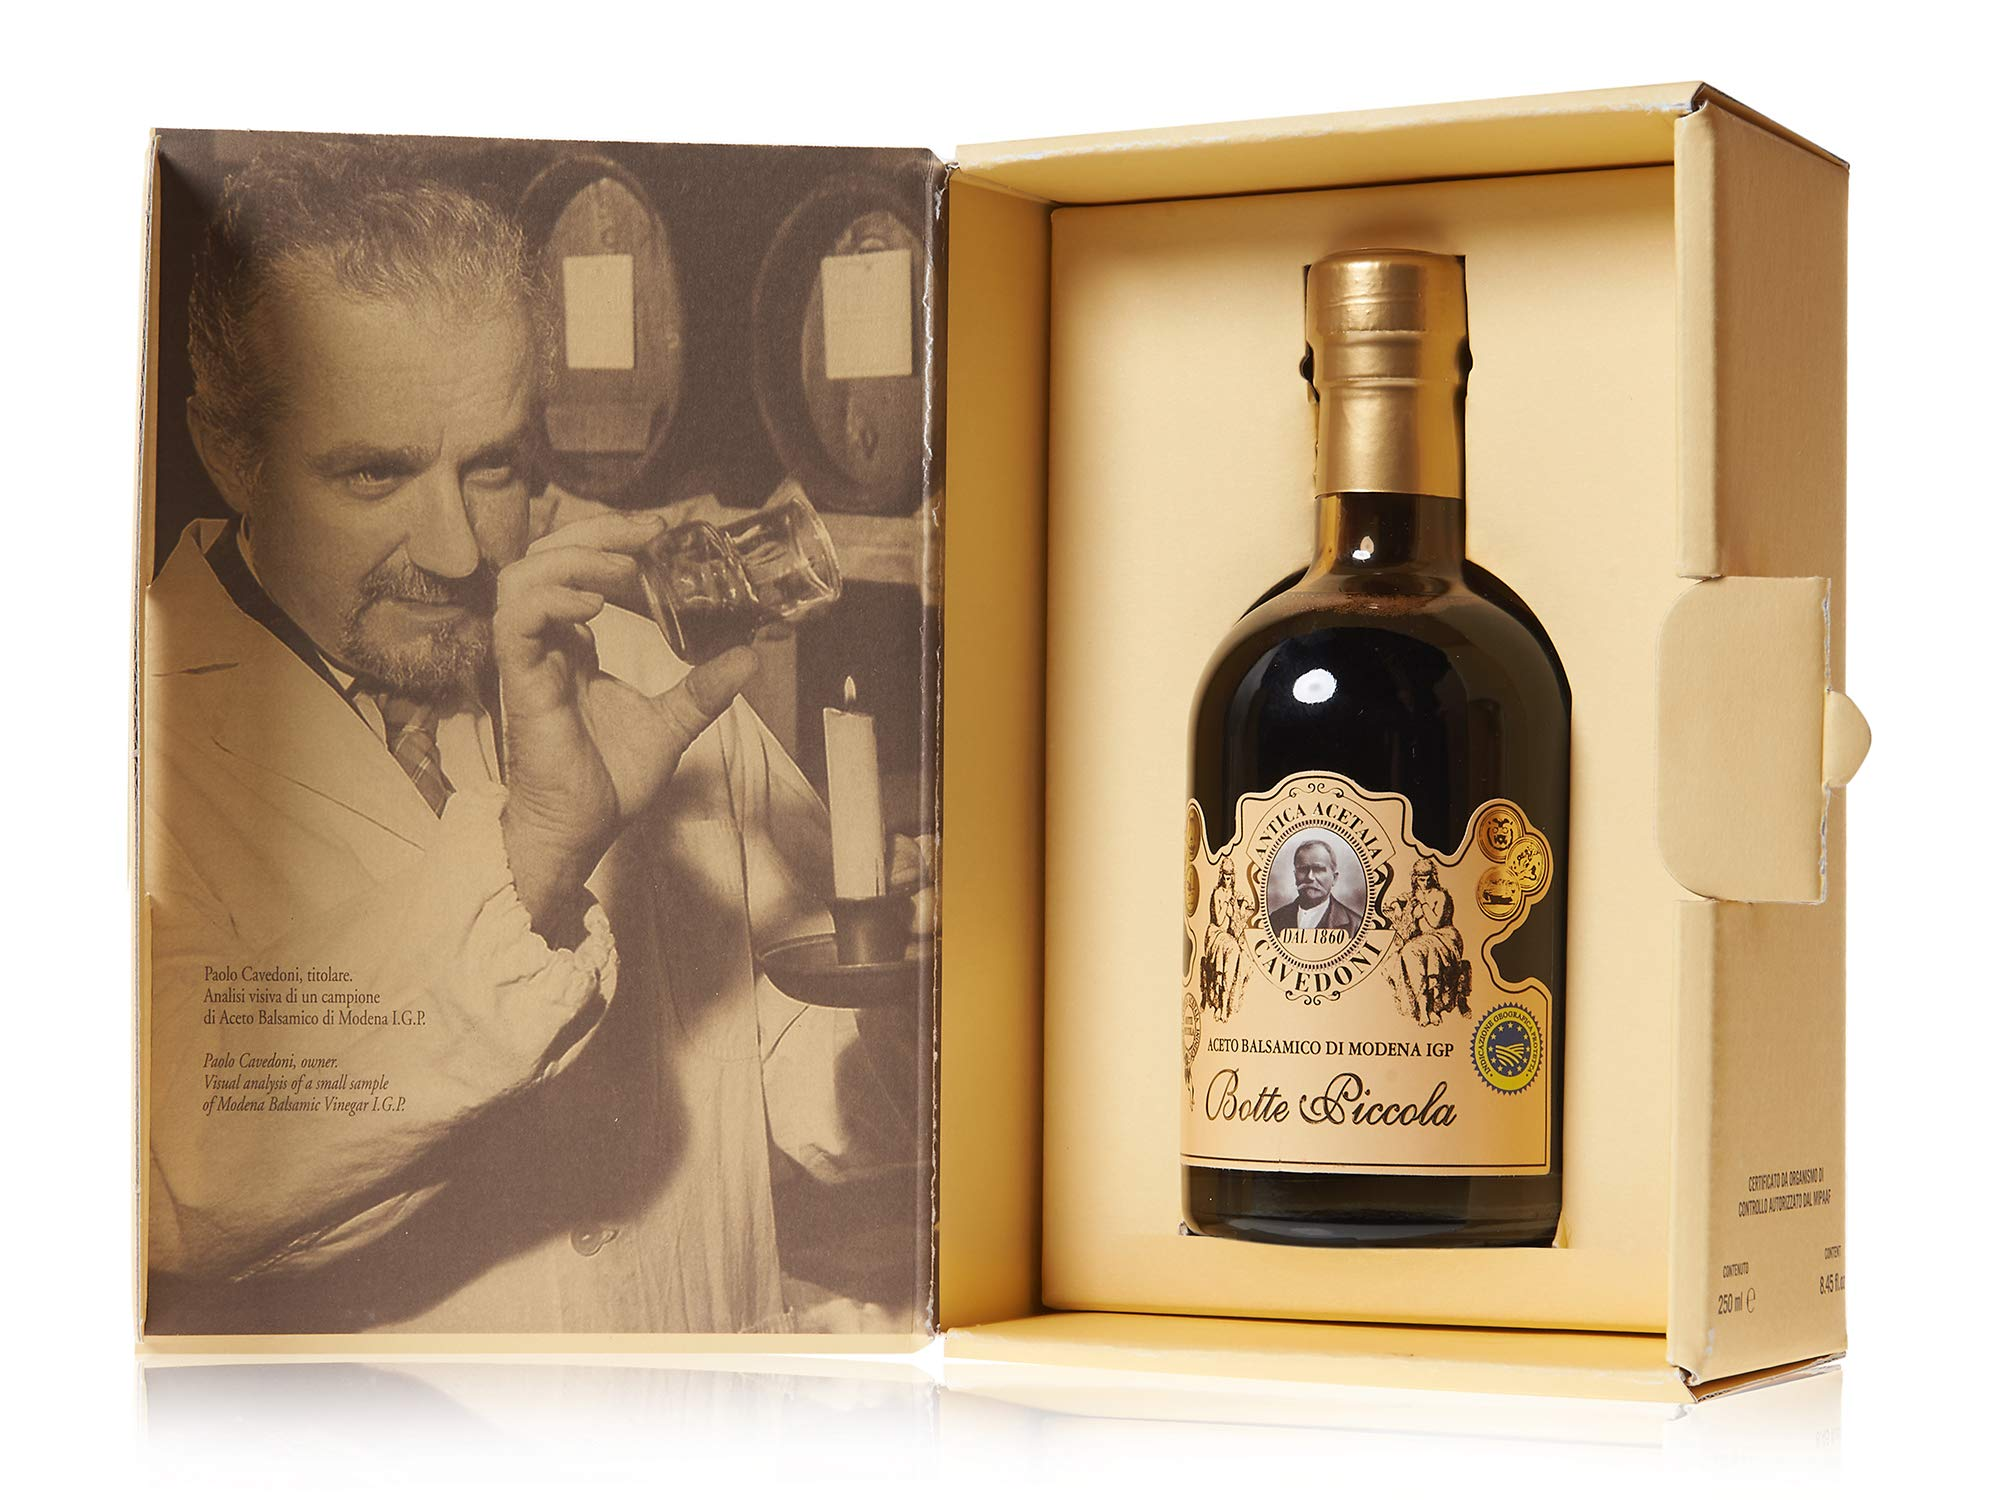 Botte Piccola Balsamic Vinegar IGP, 250ml Bottle by Cavedoni